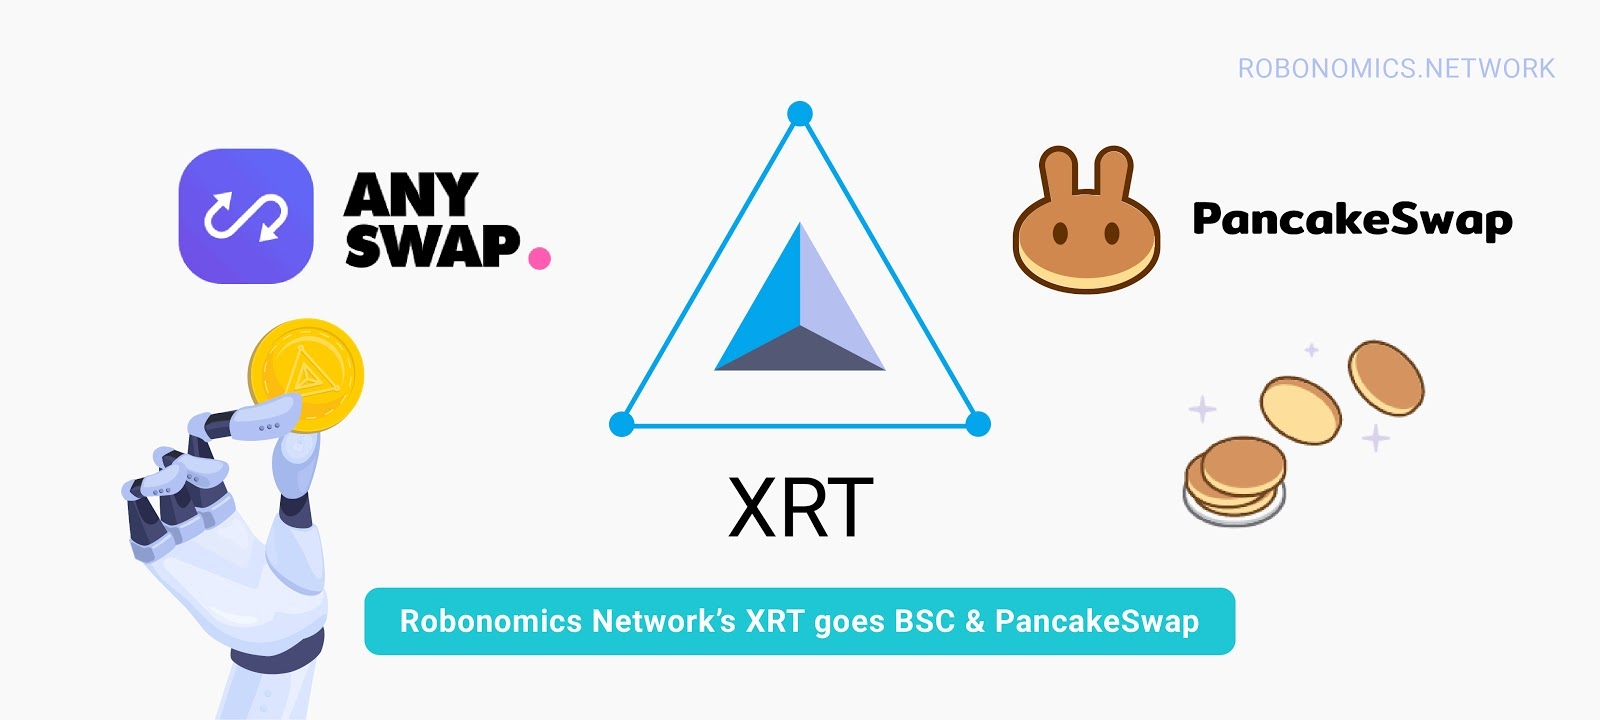 XRT pasa a BSC y PancakeSwap